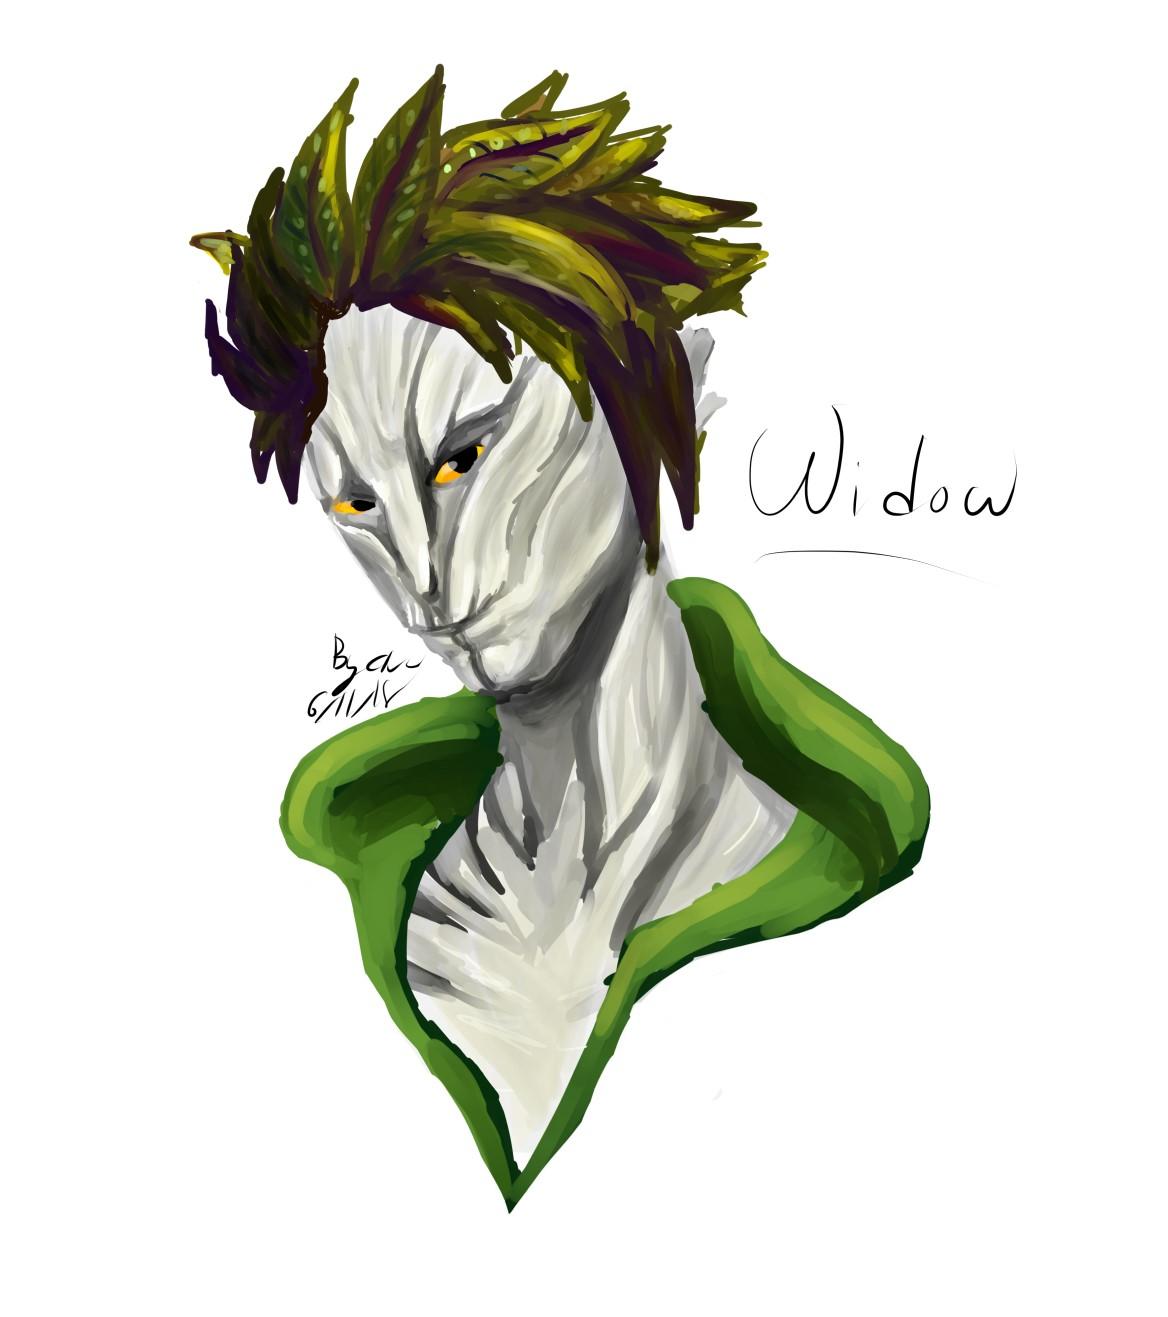 Widow2.jpg